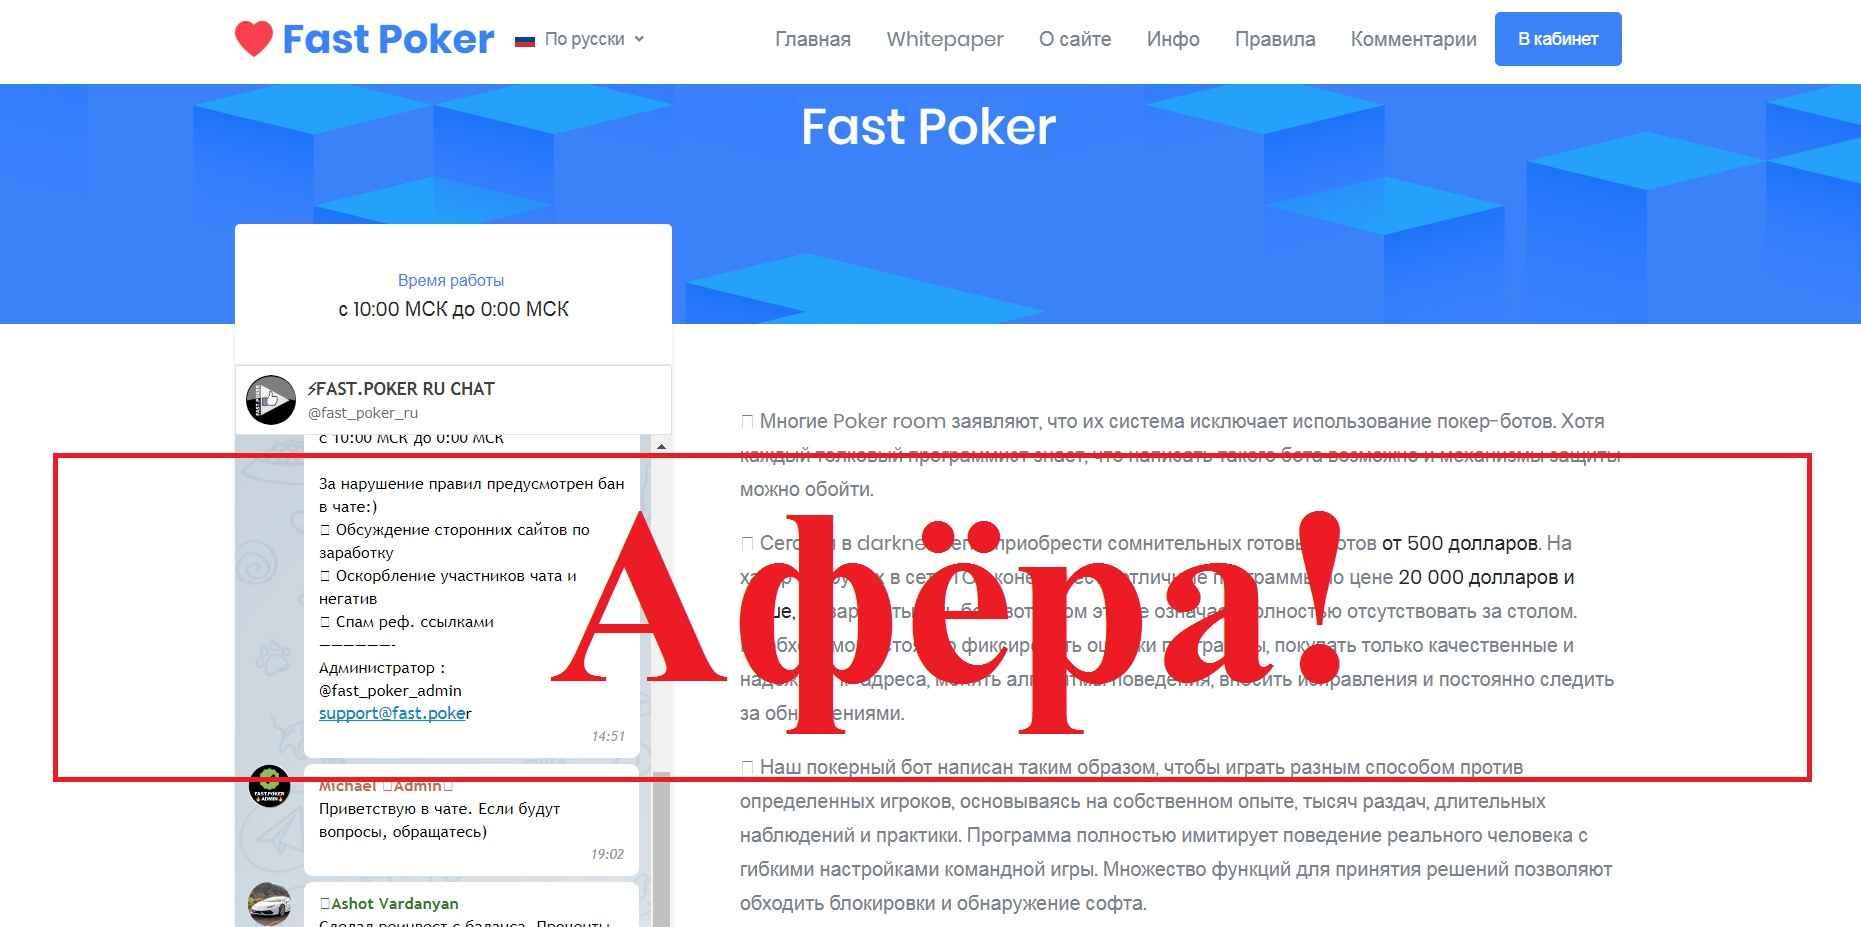 Fast Poker – покерный бот fast.poker отзывы